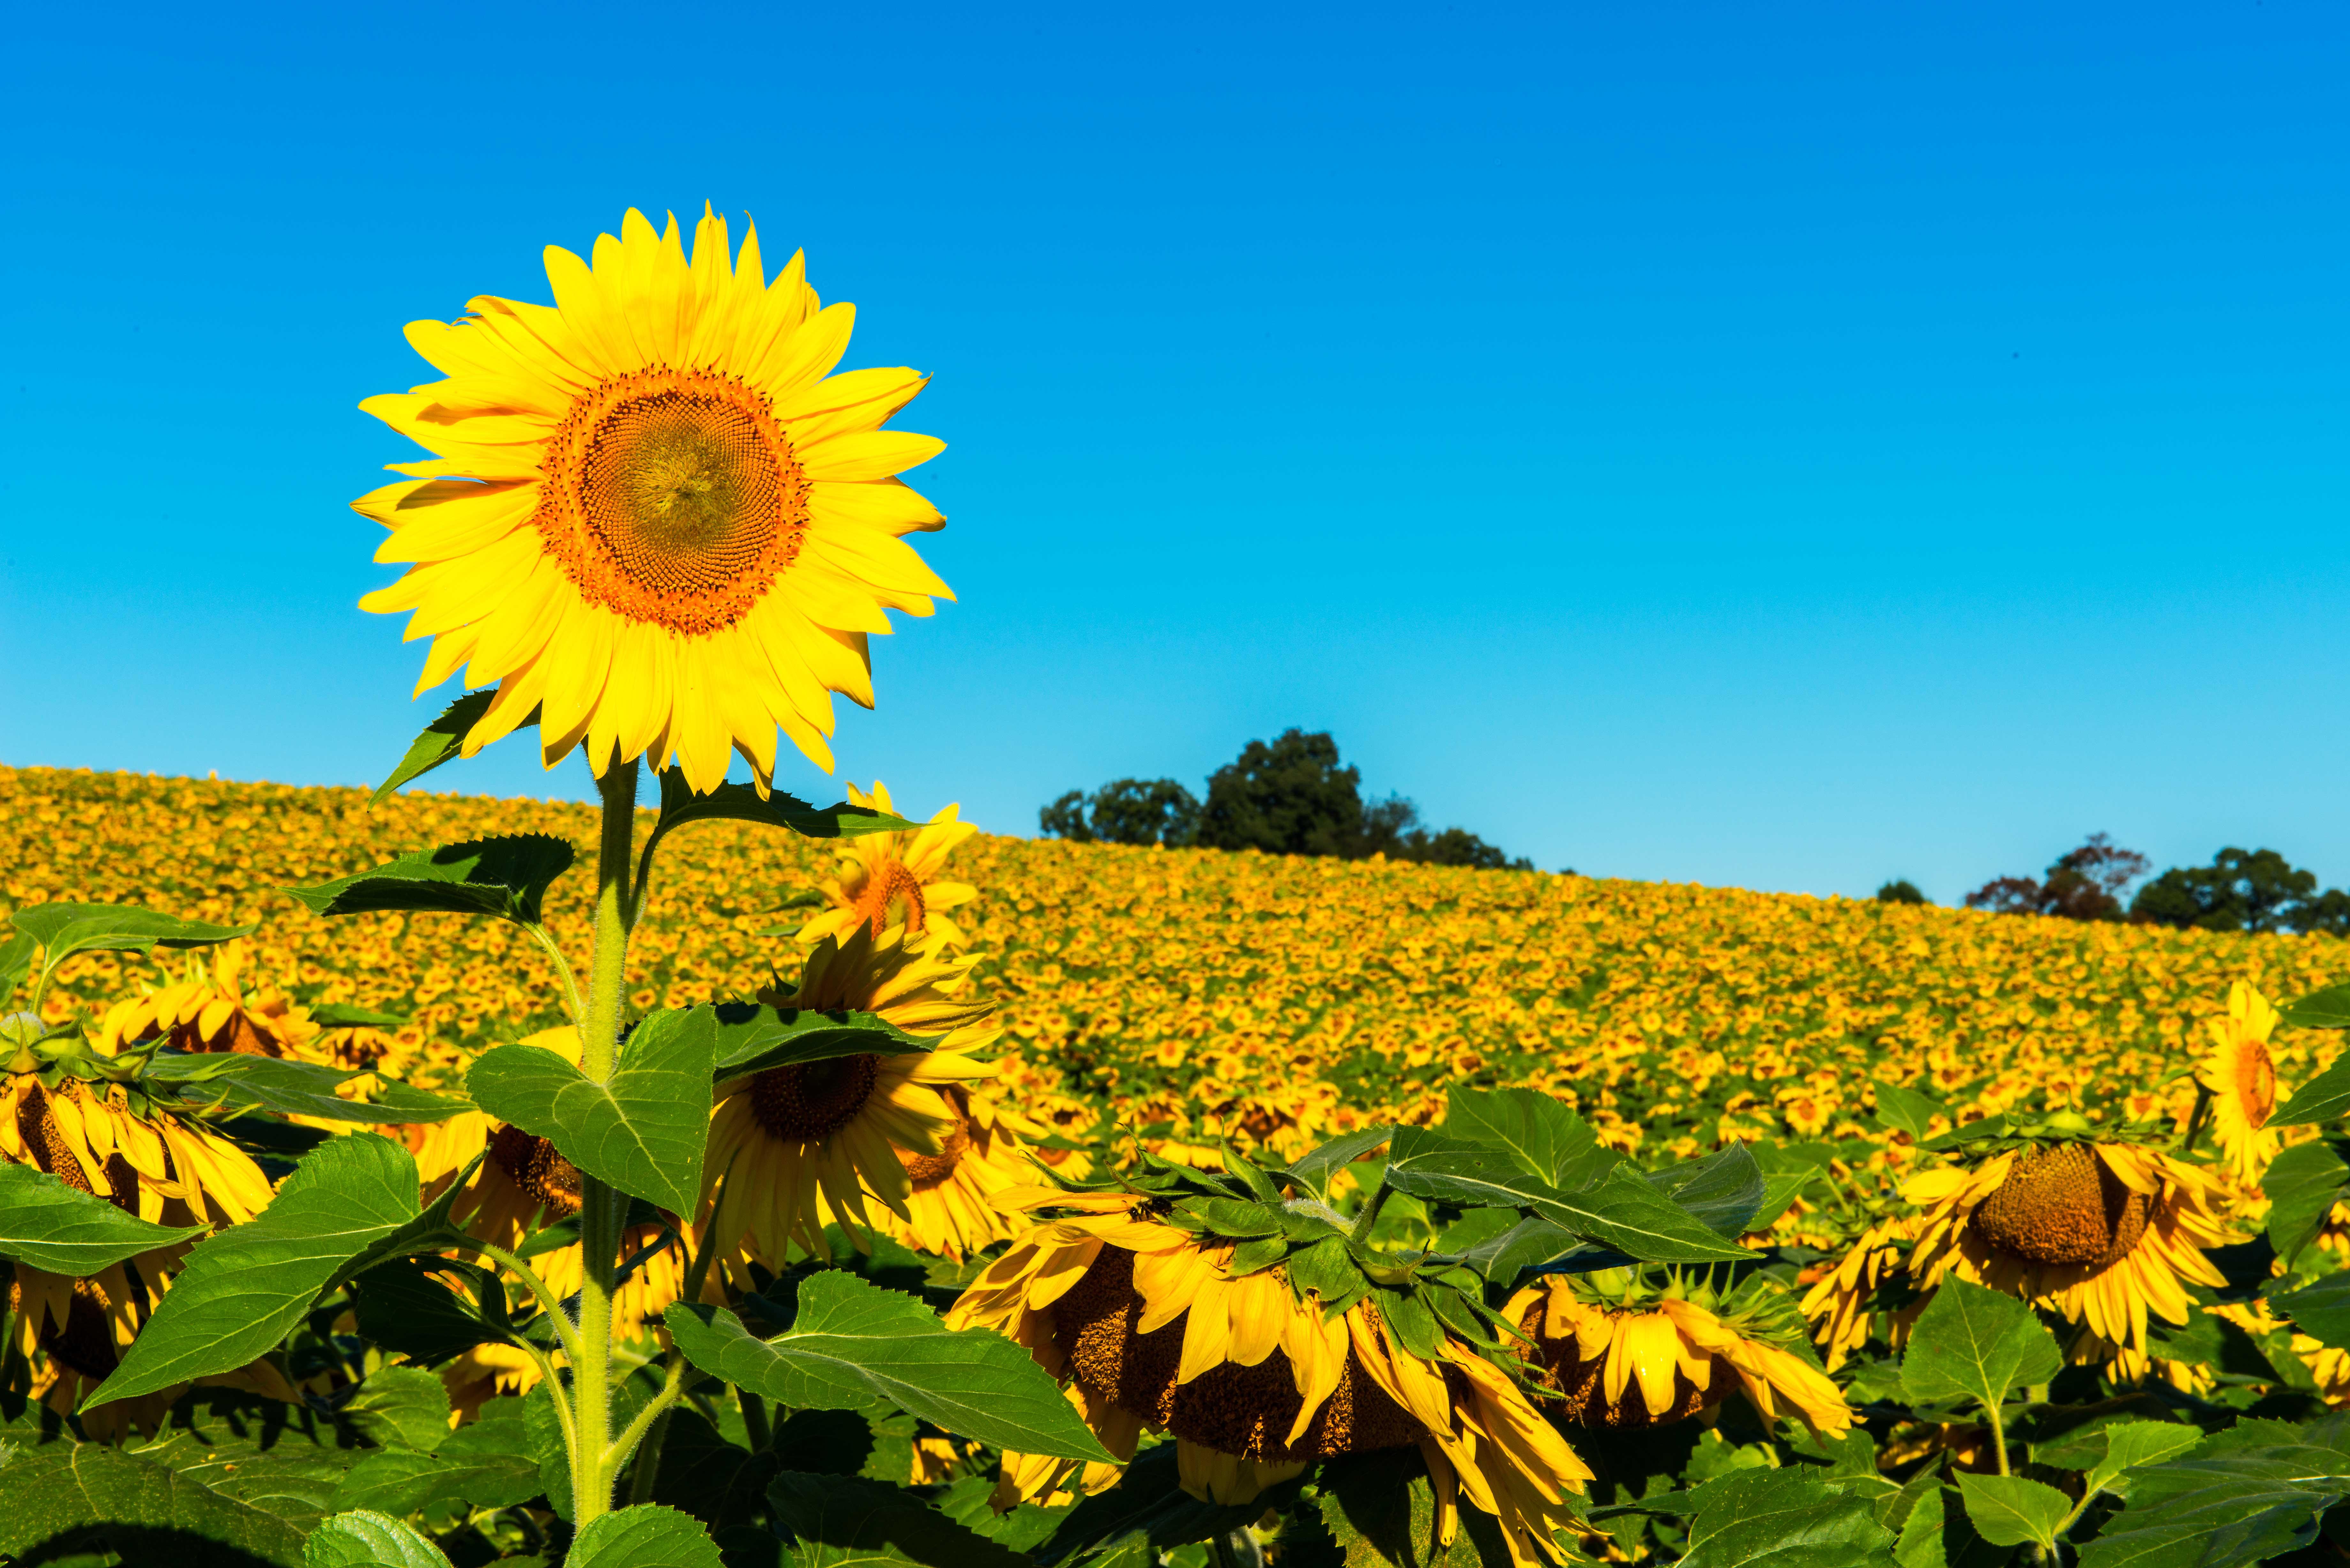 Maryland Sunflowers | Stephen L Tabone Nature Photography